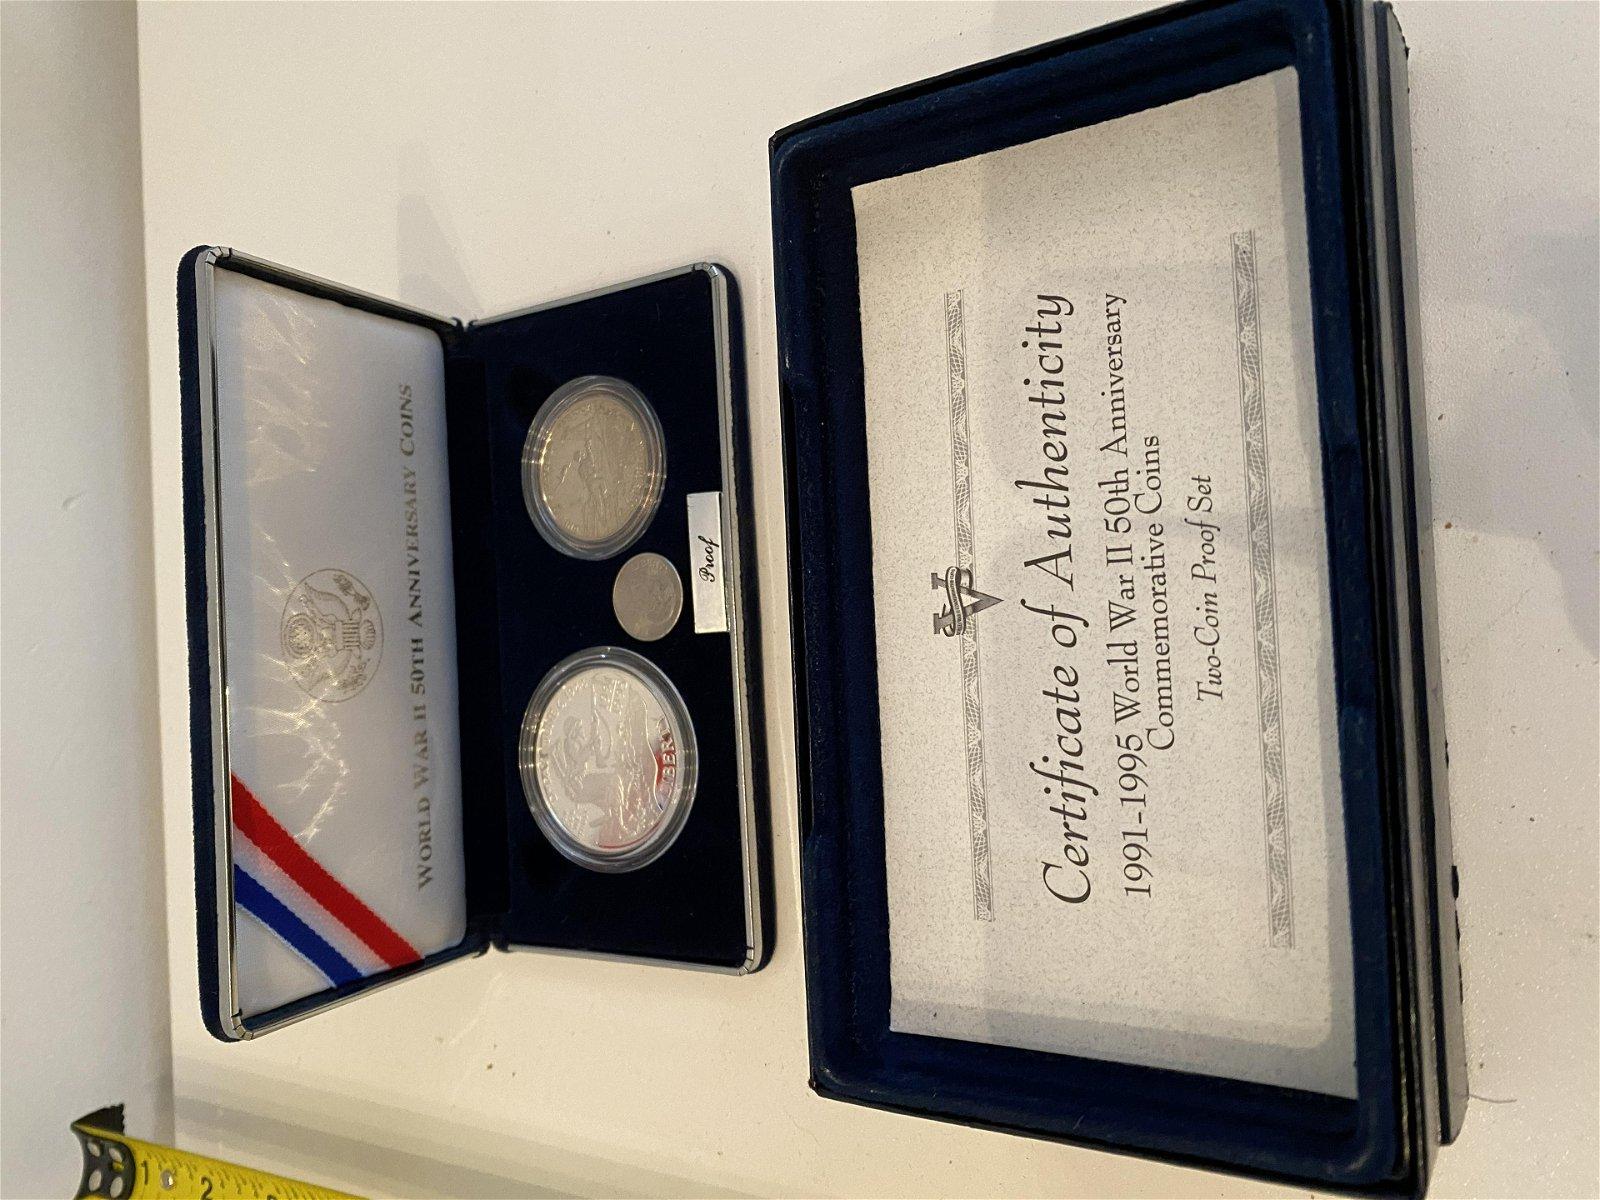 1991-1995 WW2 50TH ANNIV. 2 SILVER COIN PROOF SET